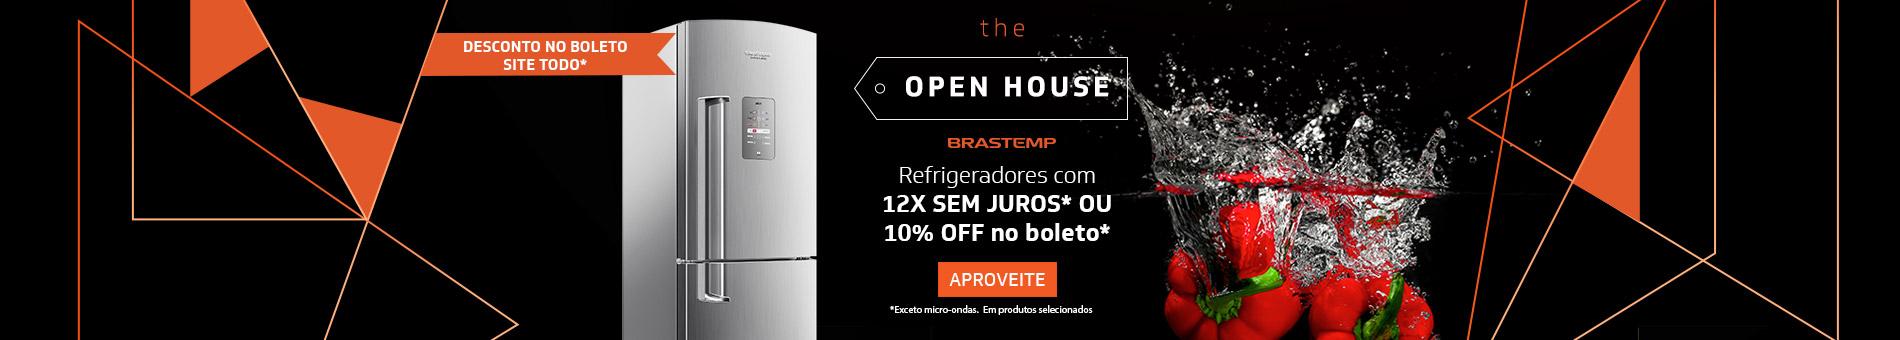 Promoção Interna - 1592 - openhouse_refri-10boleto_23022017_home1 - refri-10boleto - 1